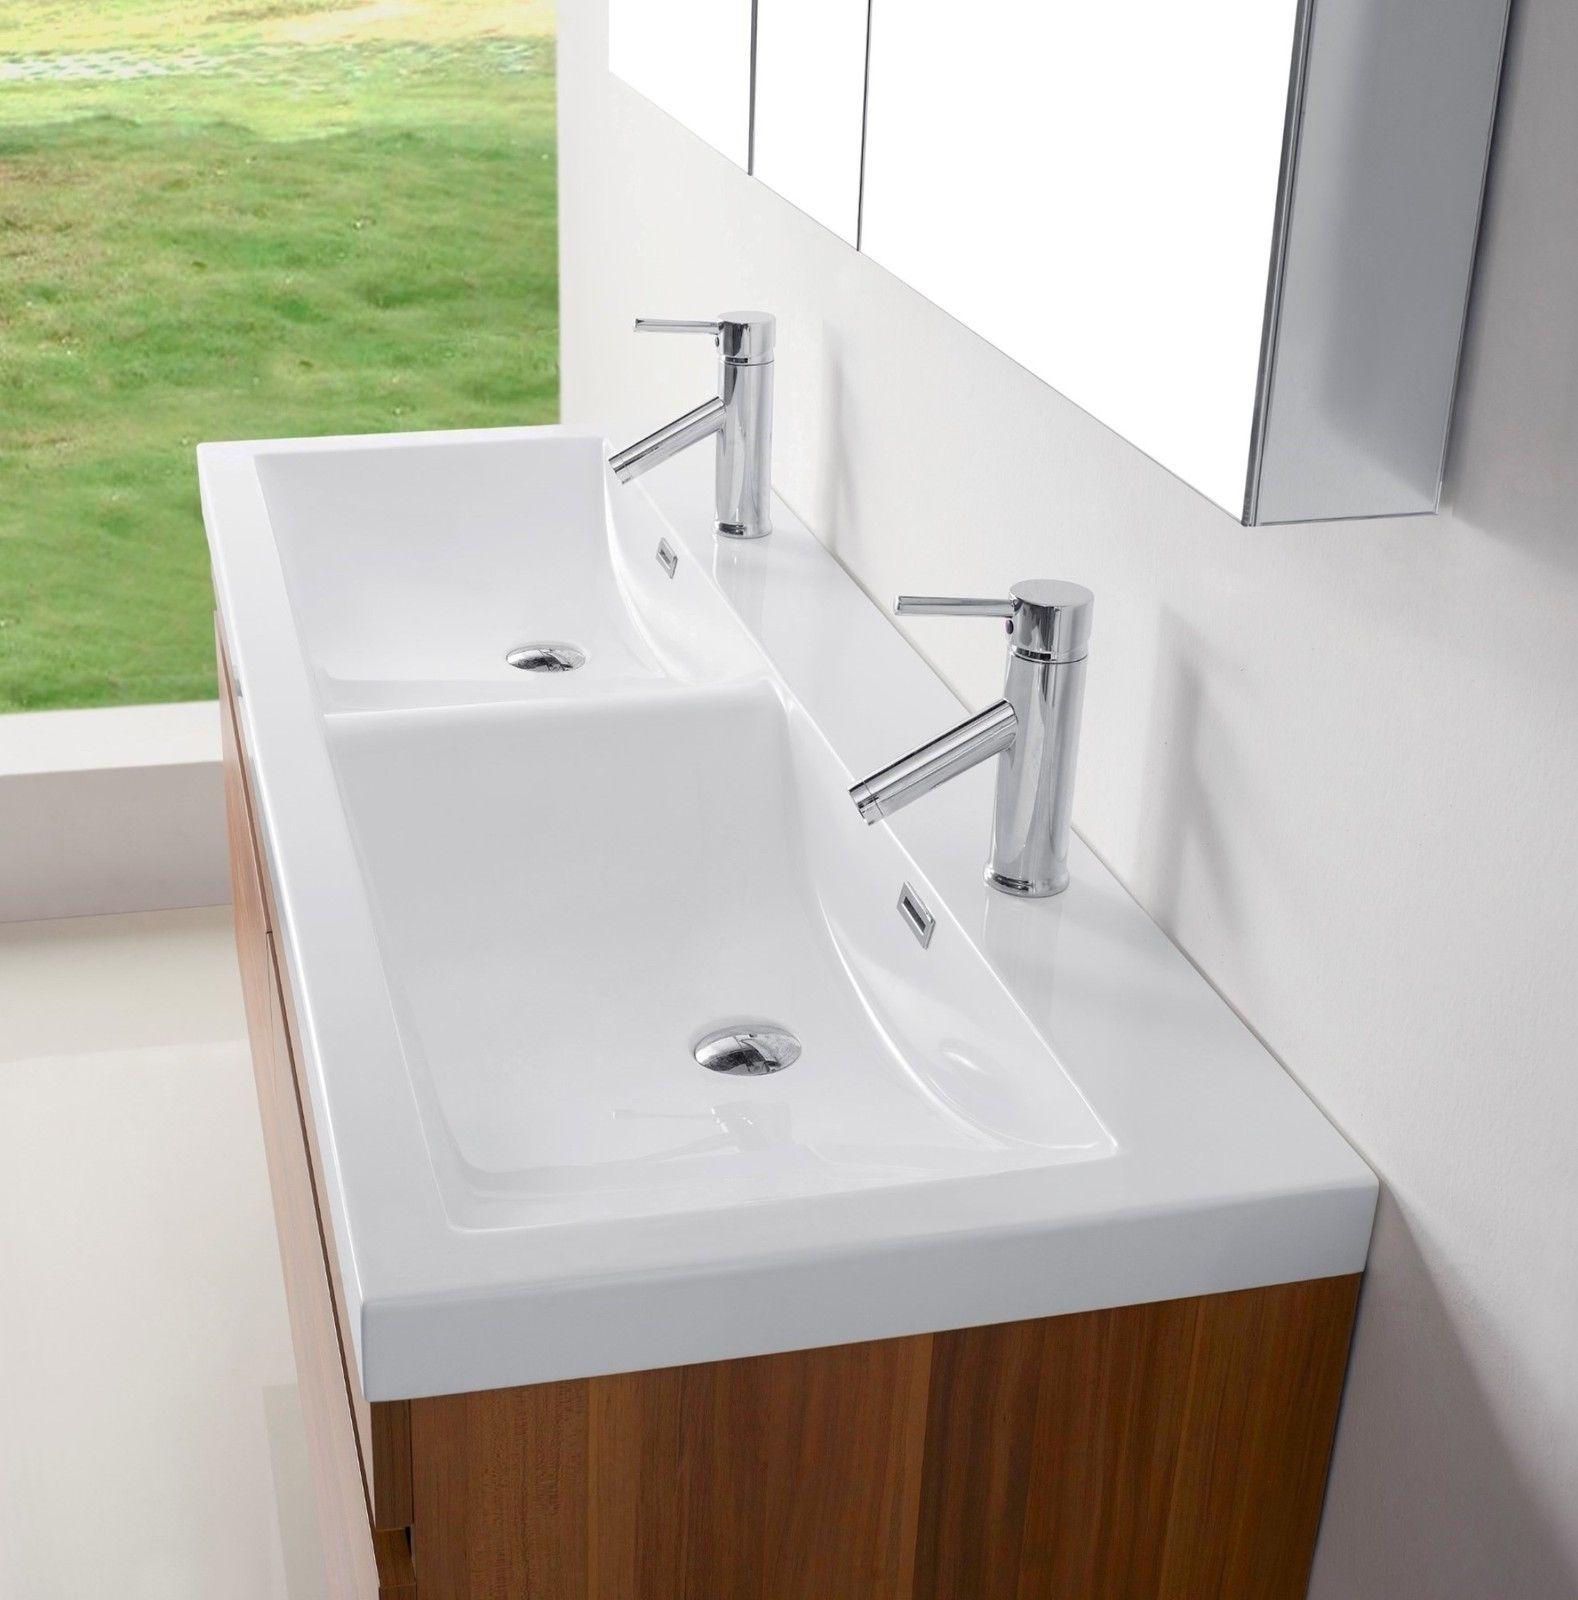 Ebay Bathroom Vanity Cabinets - Zuri 55 double bathroom vanity cabinet set in plum ebay